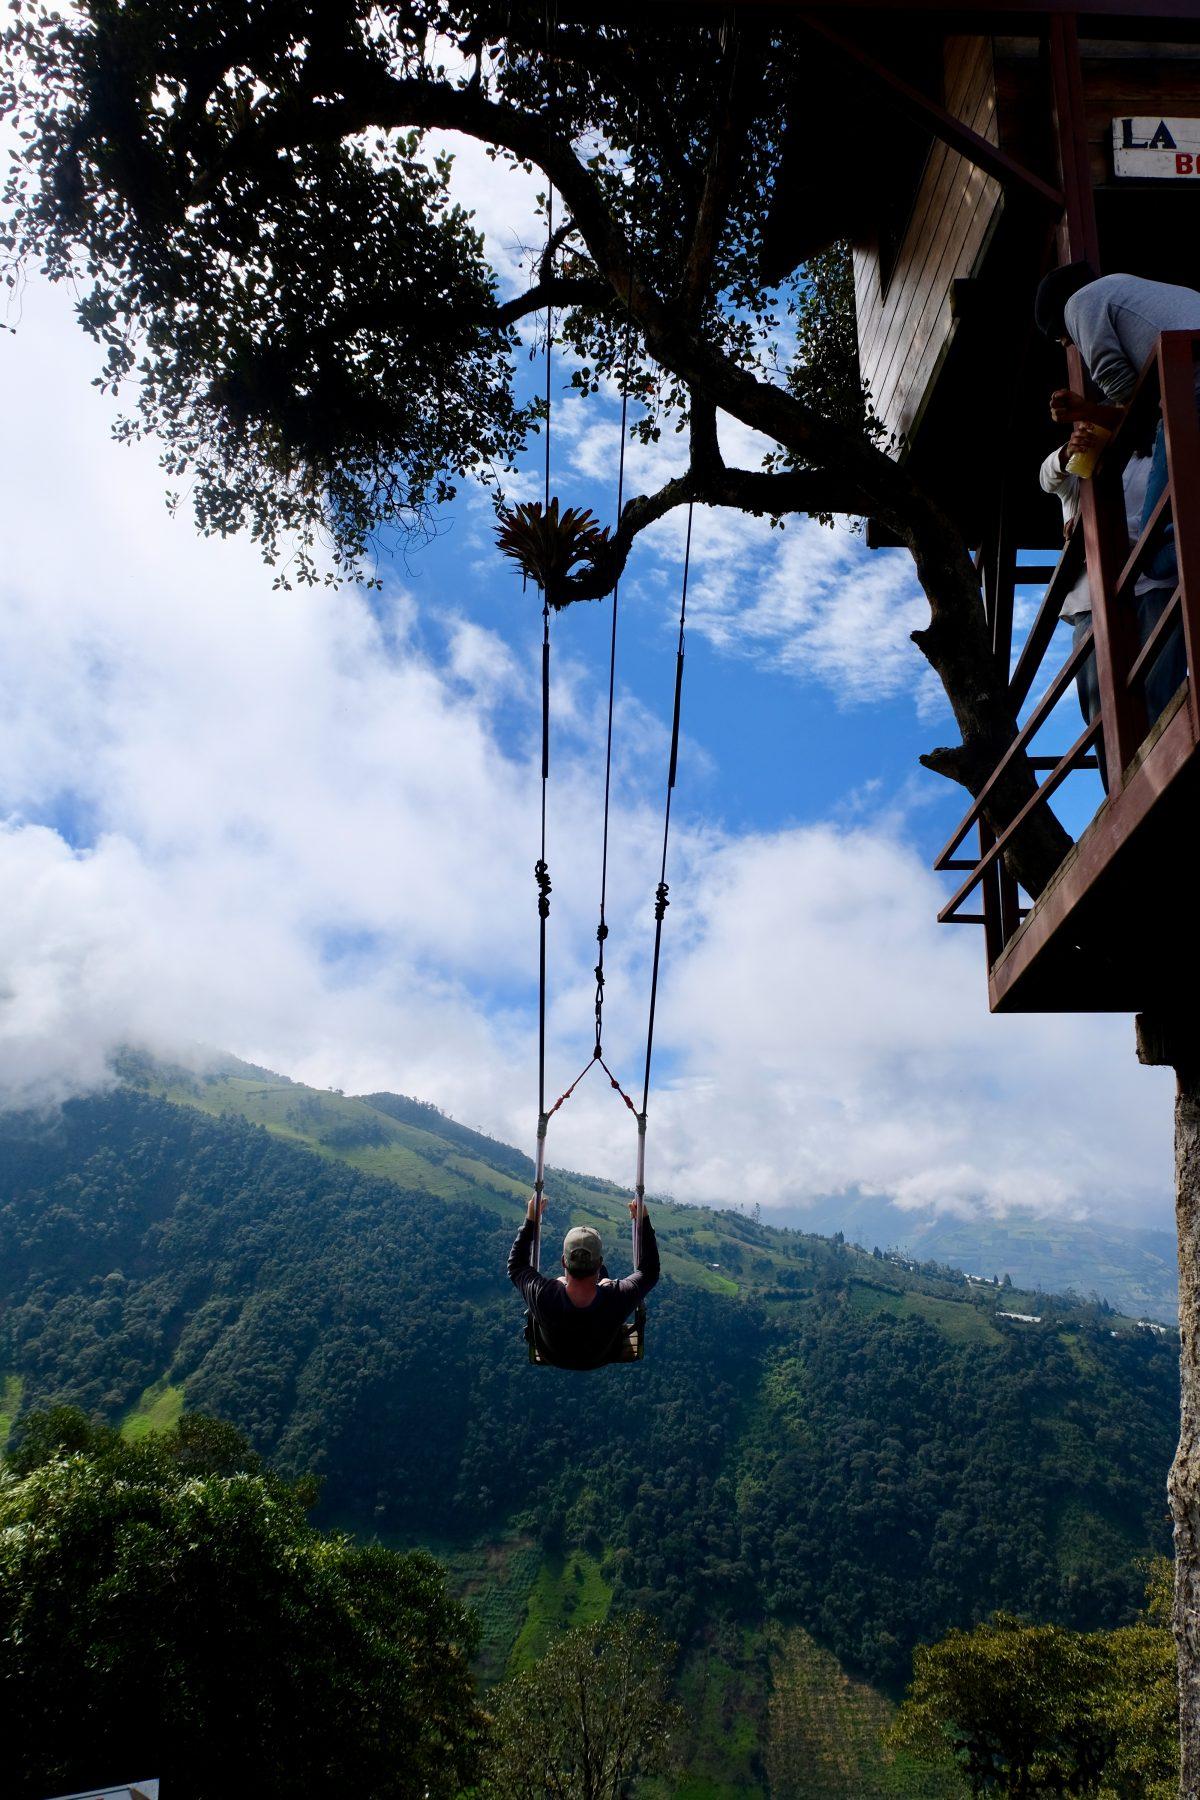 World of swinging